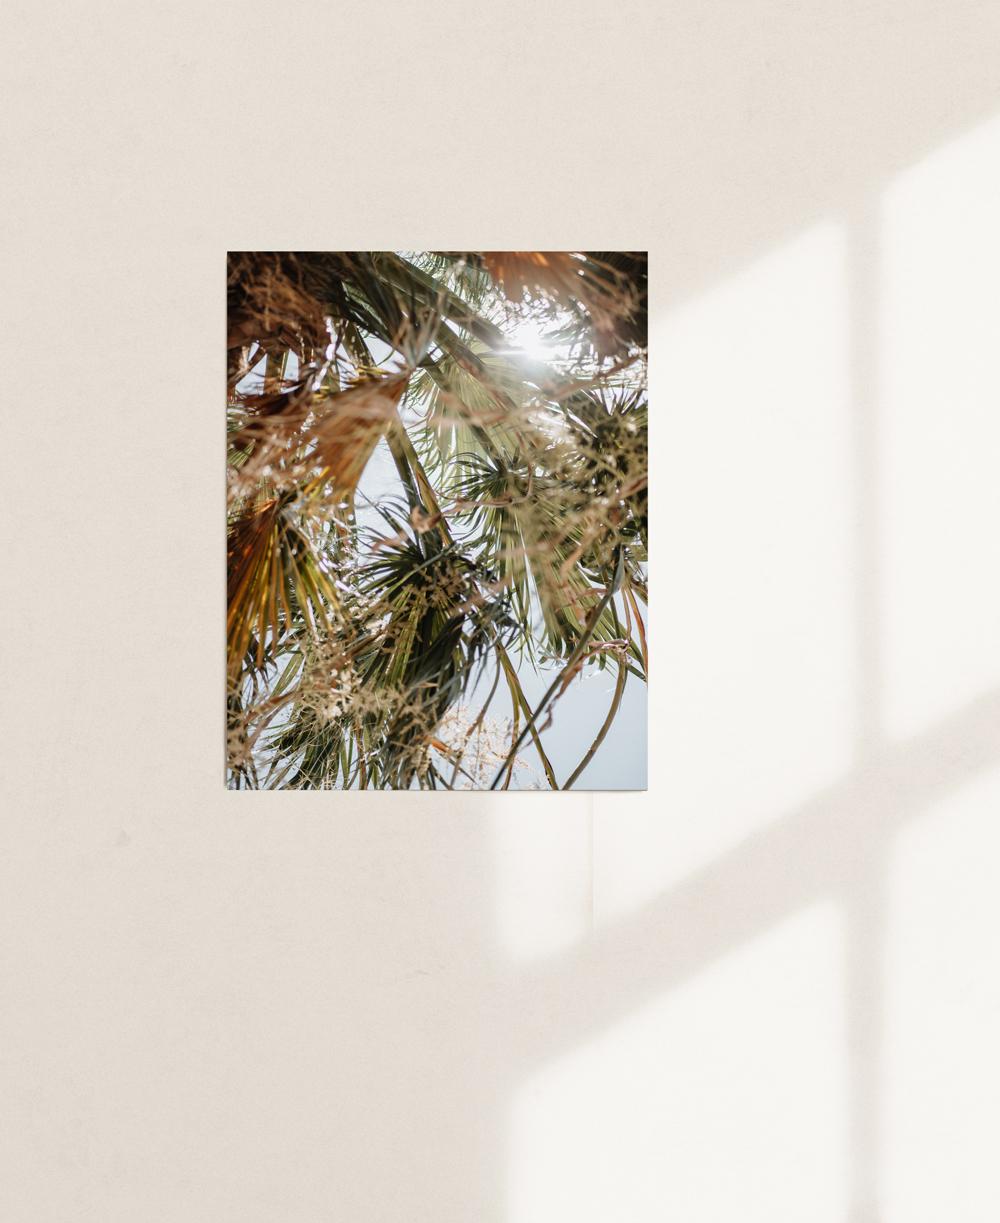 nicischwab-prints-02-010